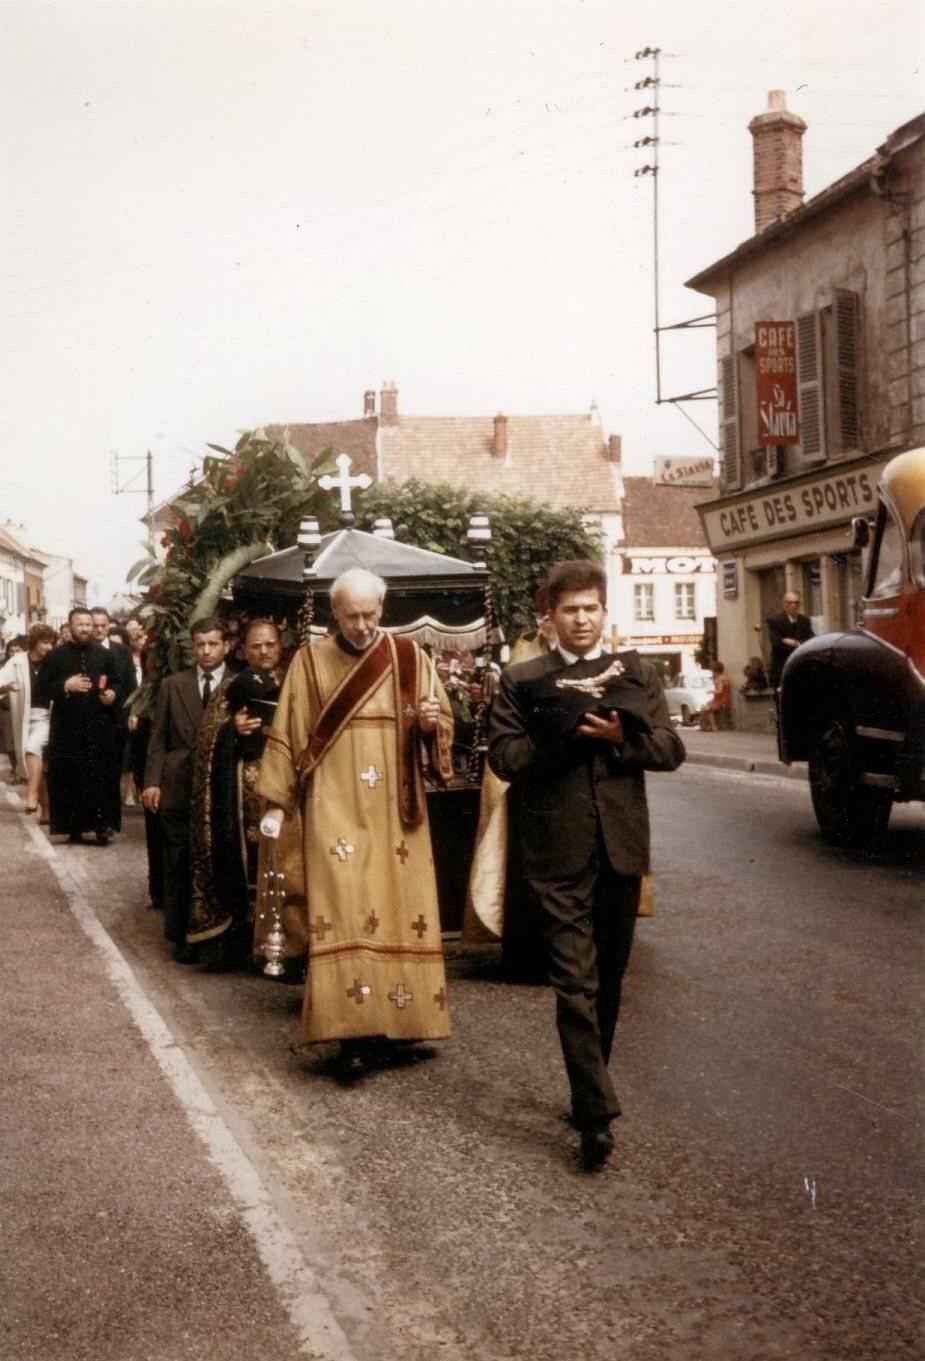 Mitropolitul Visarion Puiu - procesiunea de inmormantare hp 7